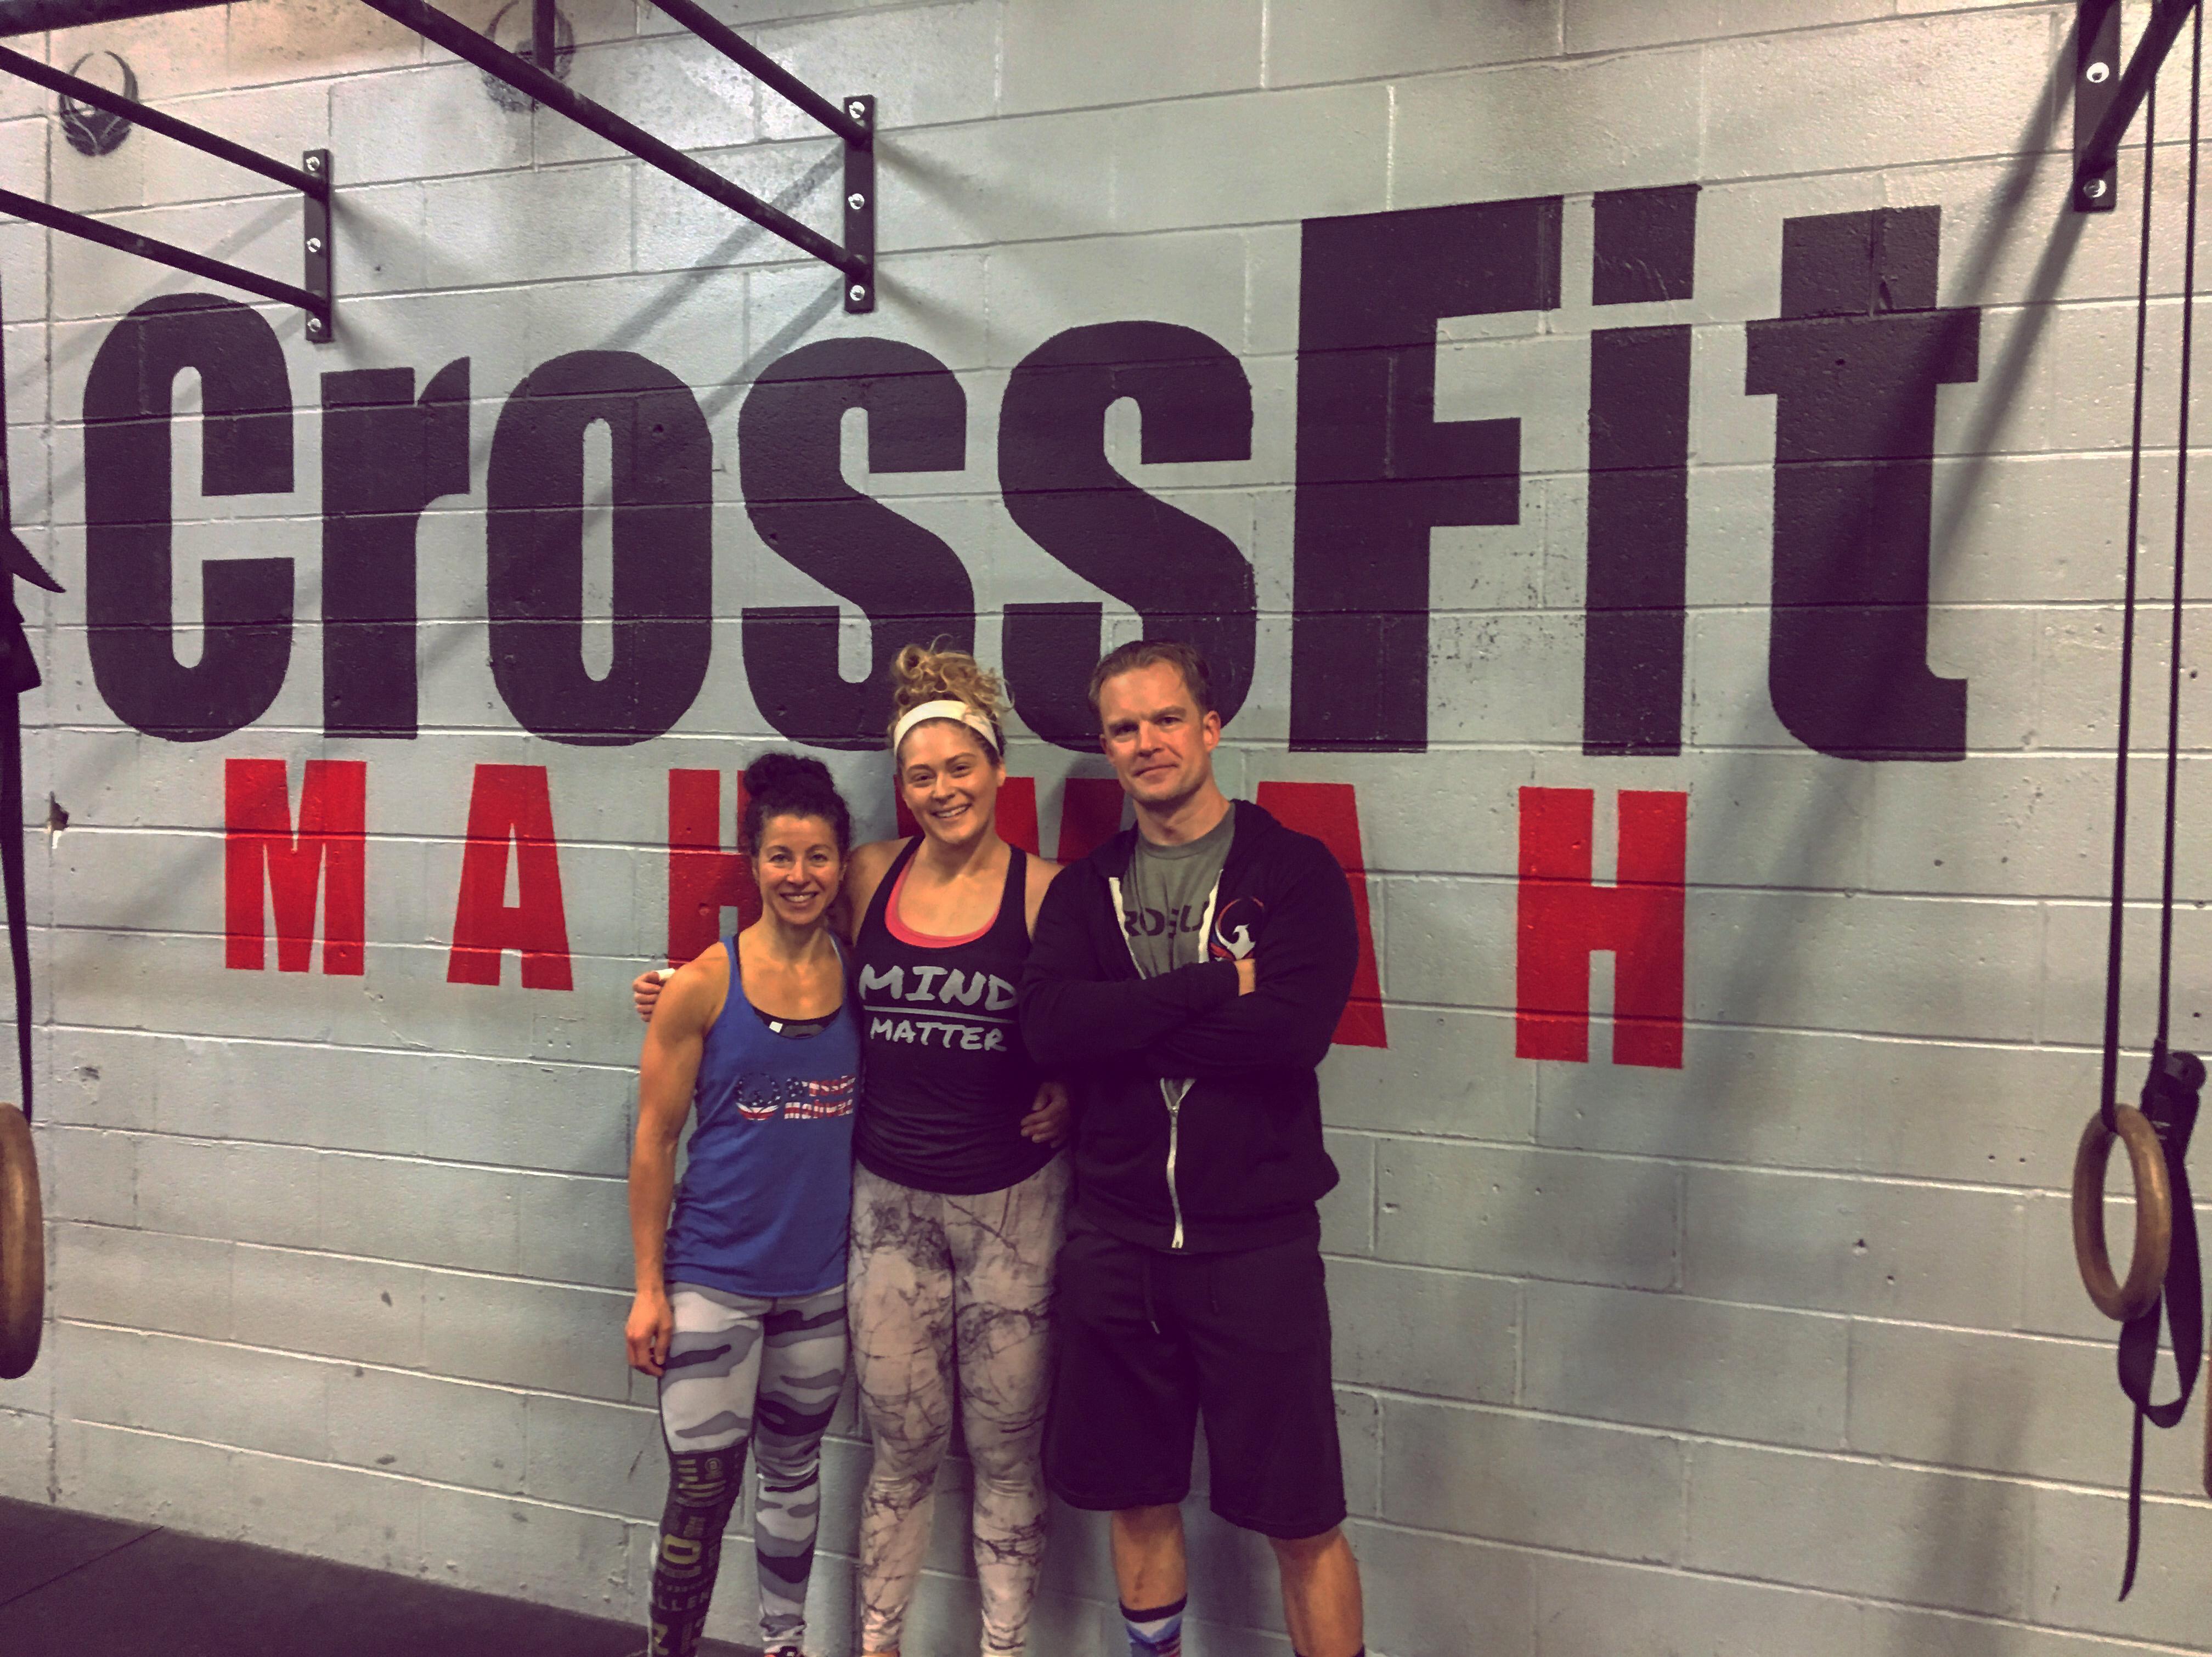 Jeryl CrossFit